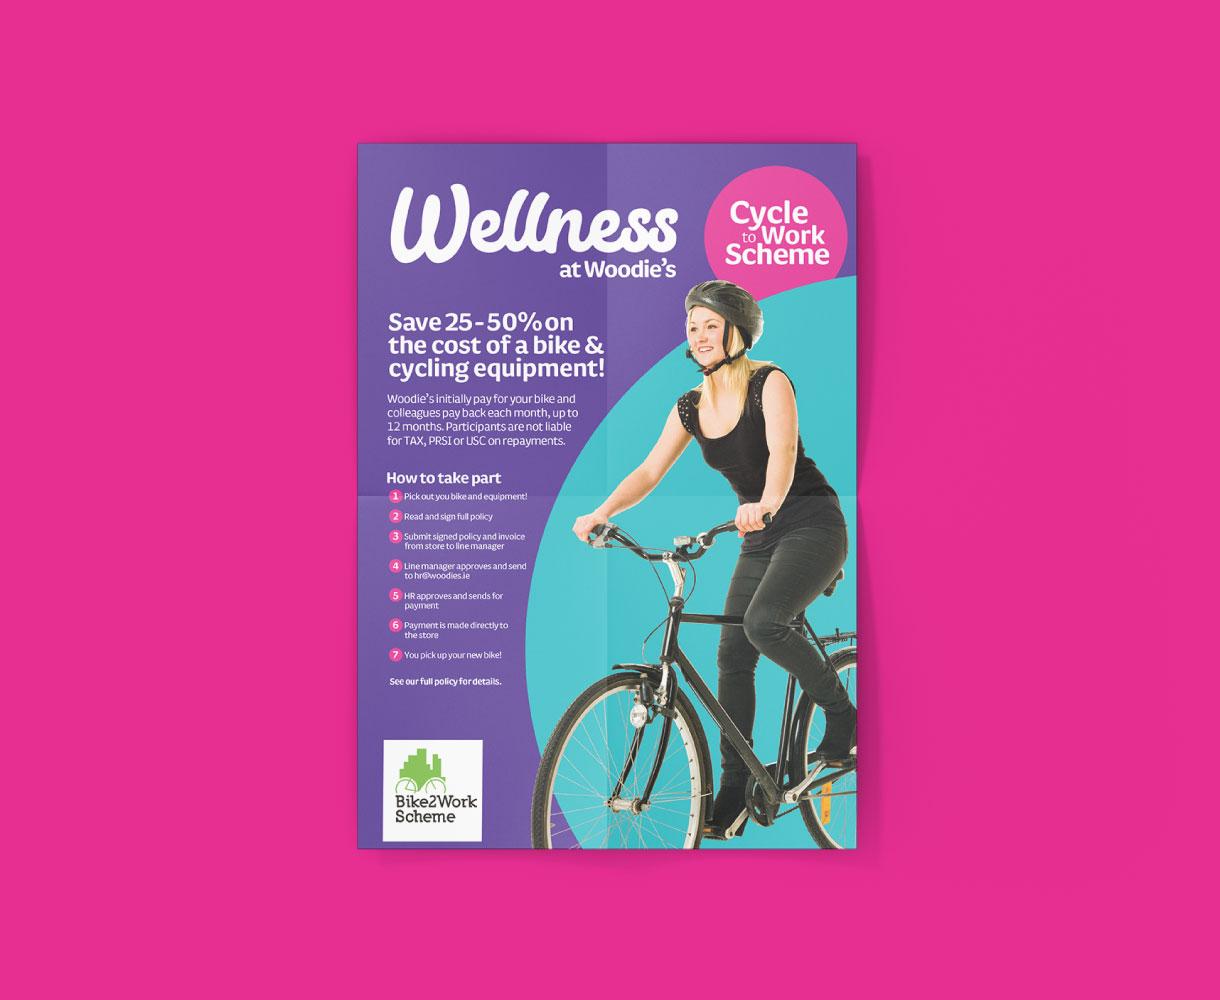 corporate-wellness-brand-dublin